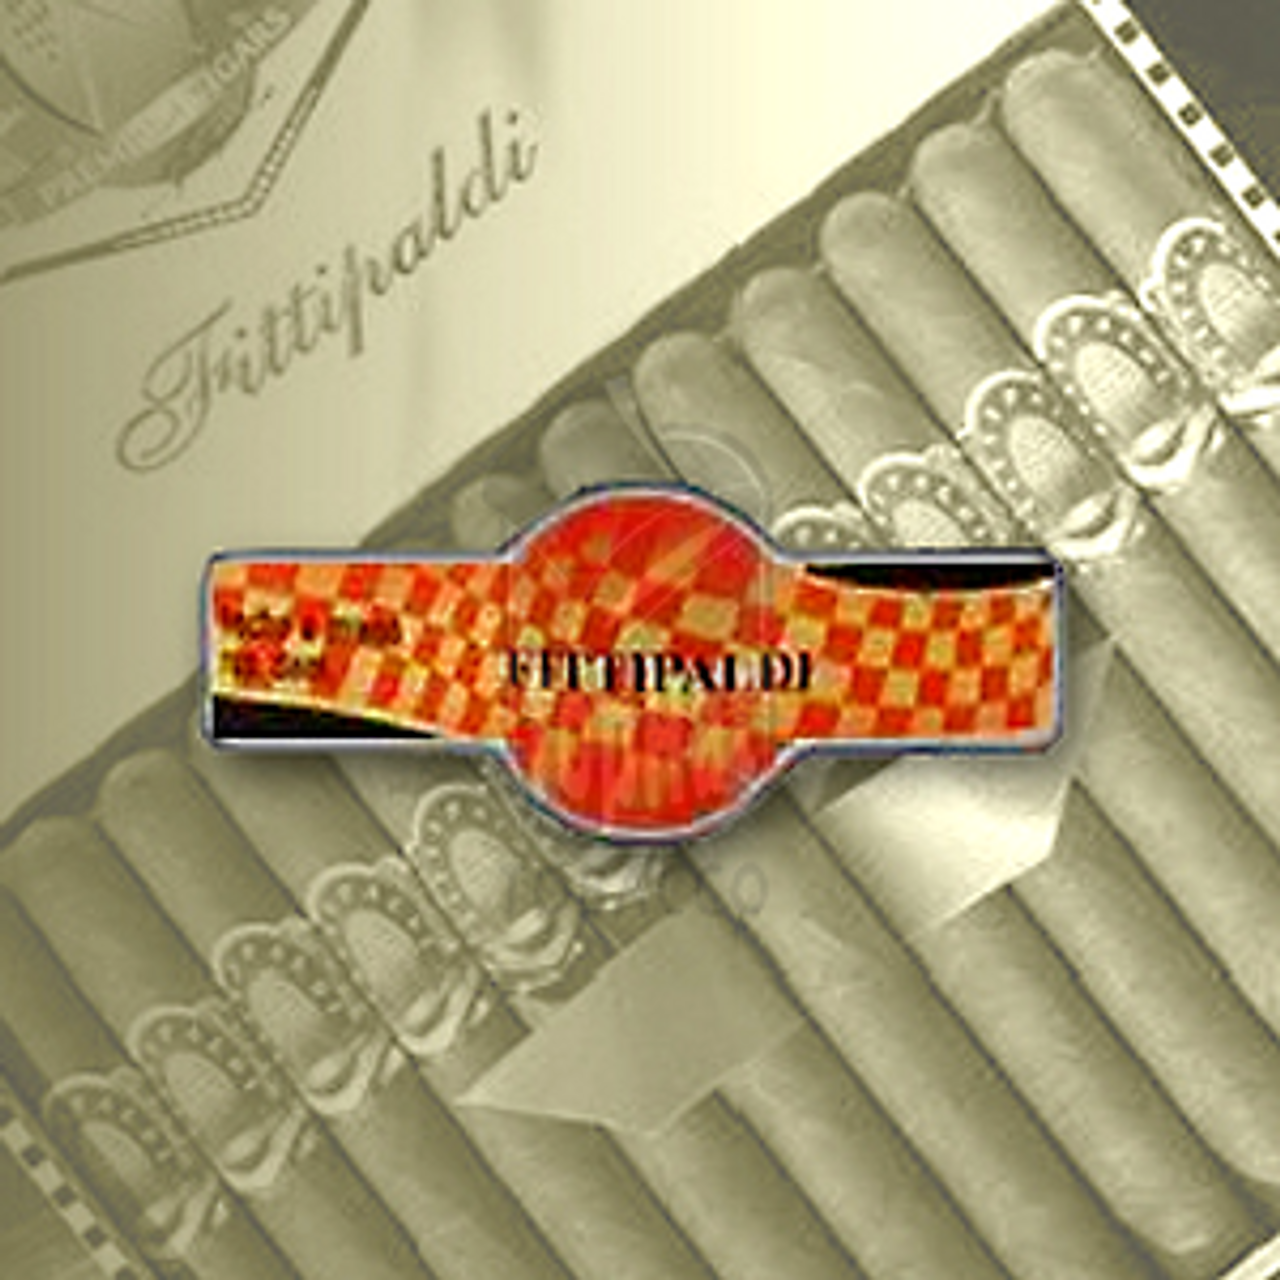 Fittipaldi Valentina Mandarin Cigars - 3 3/8 x 22 (5 Tins of 13)